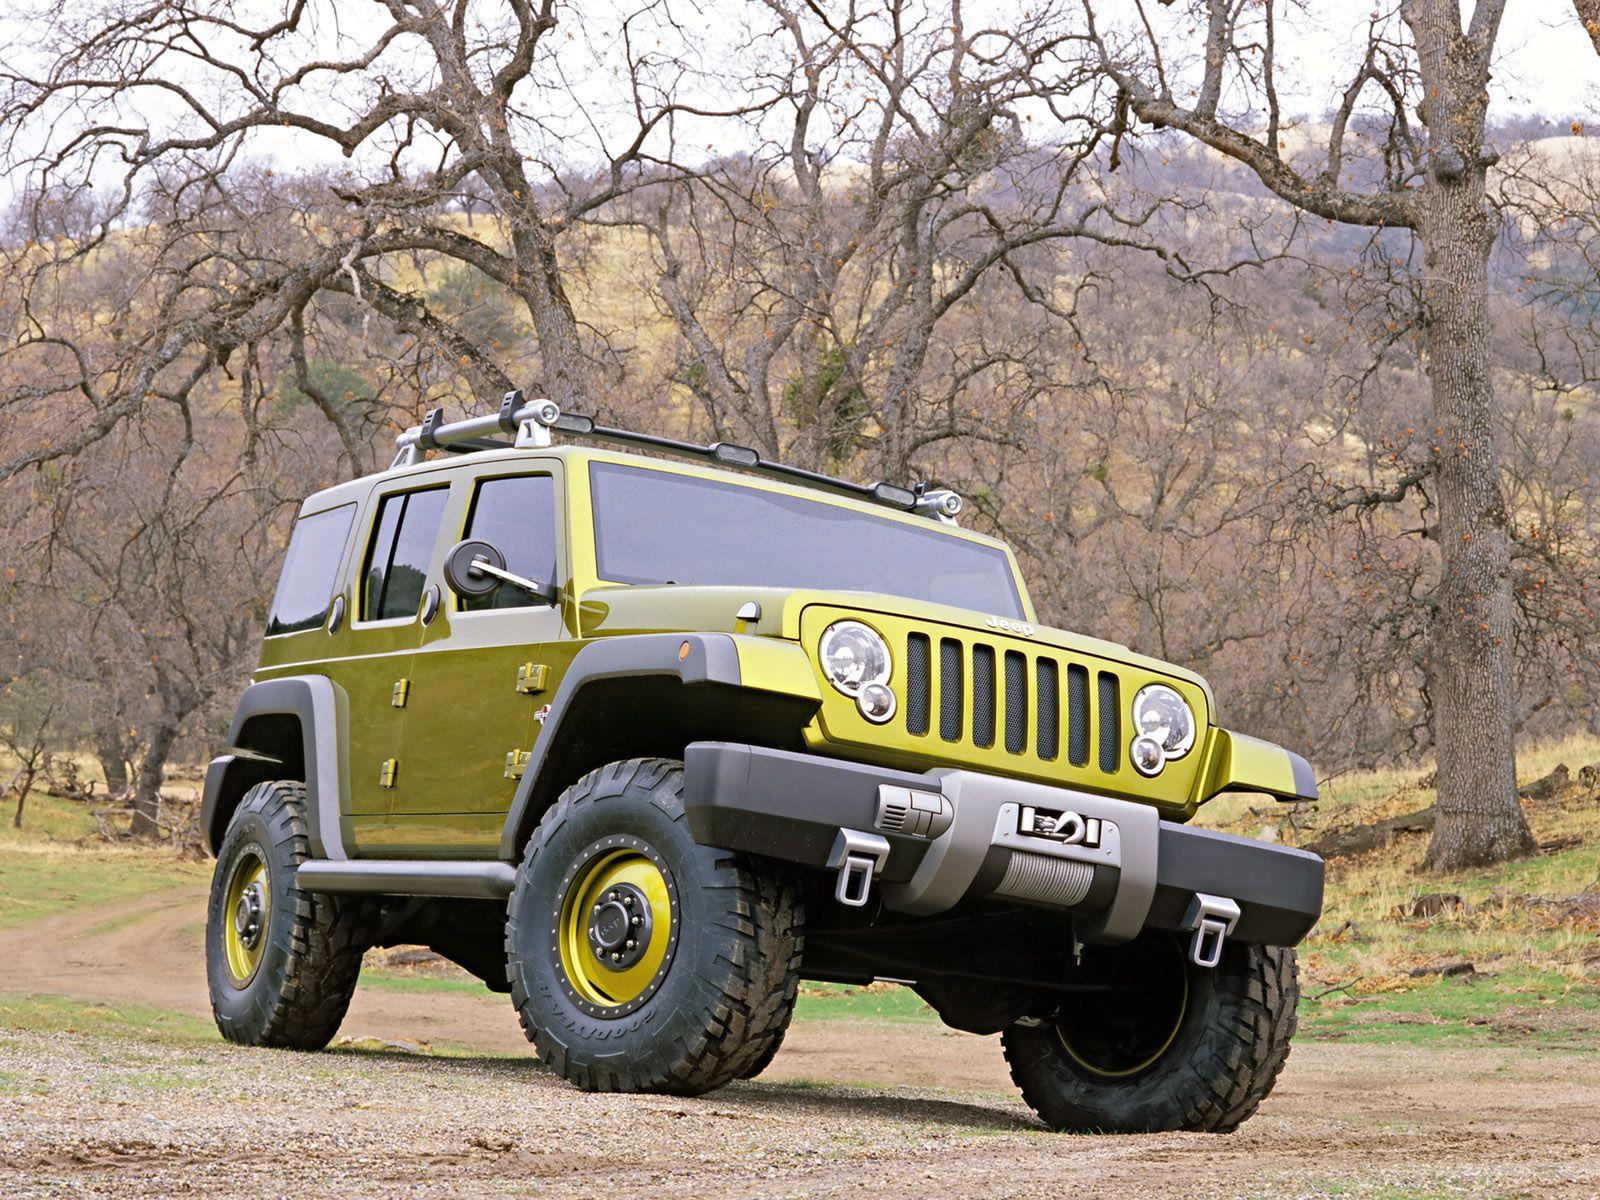 Jeep Rescue Concept Concept Cars Jeep Jeep Truck